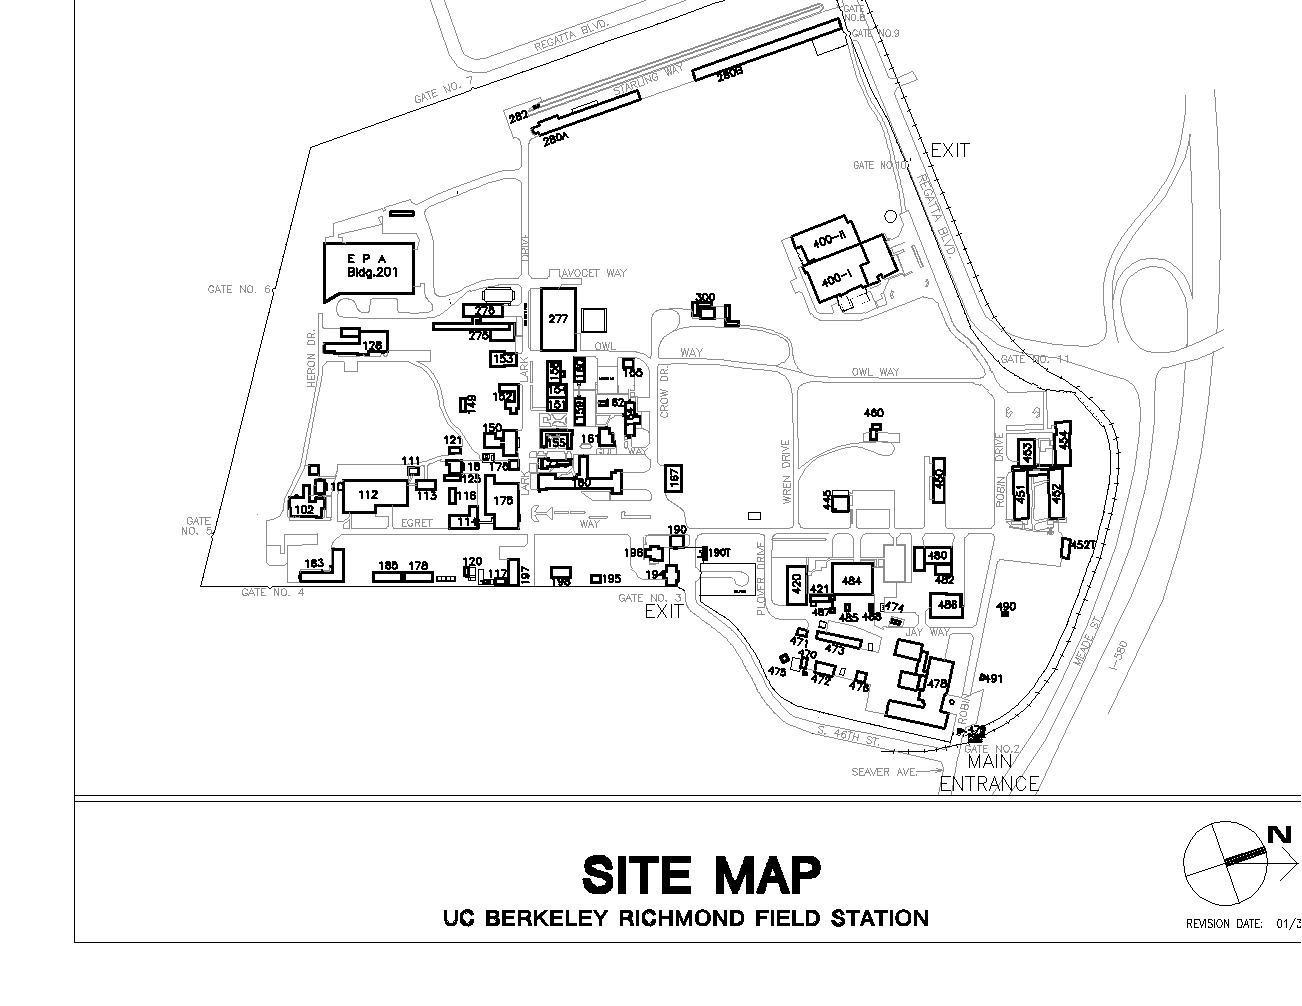 Campus Maps Uc San Francisco miromar outlet map wayne pa map